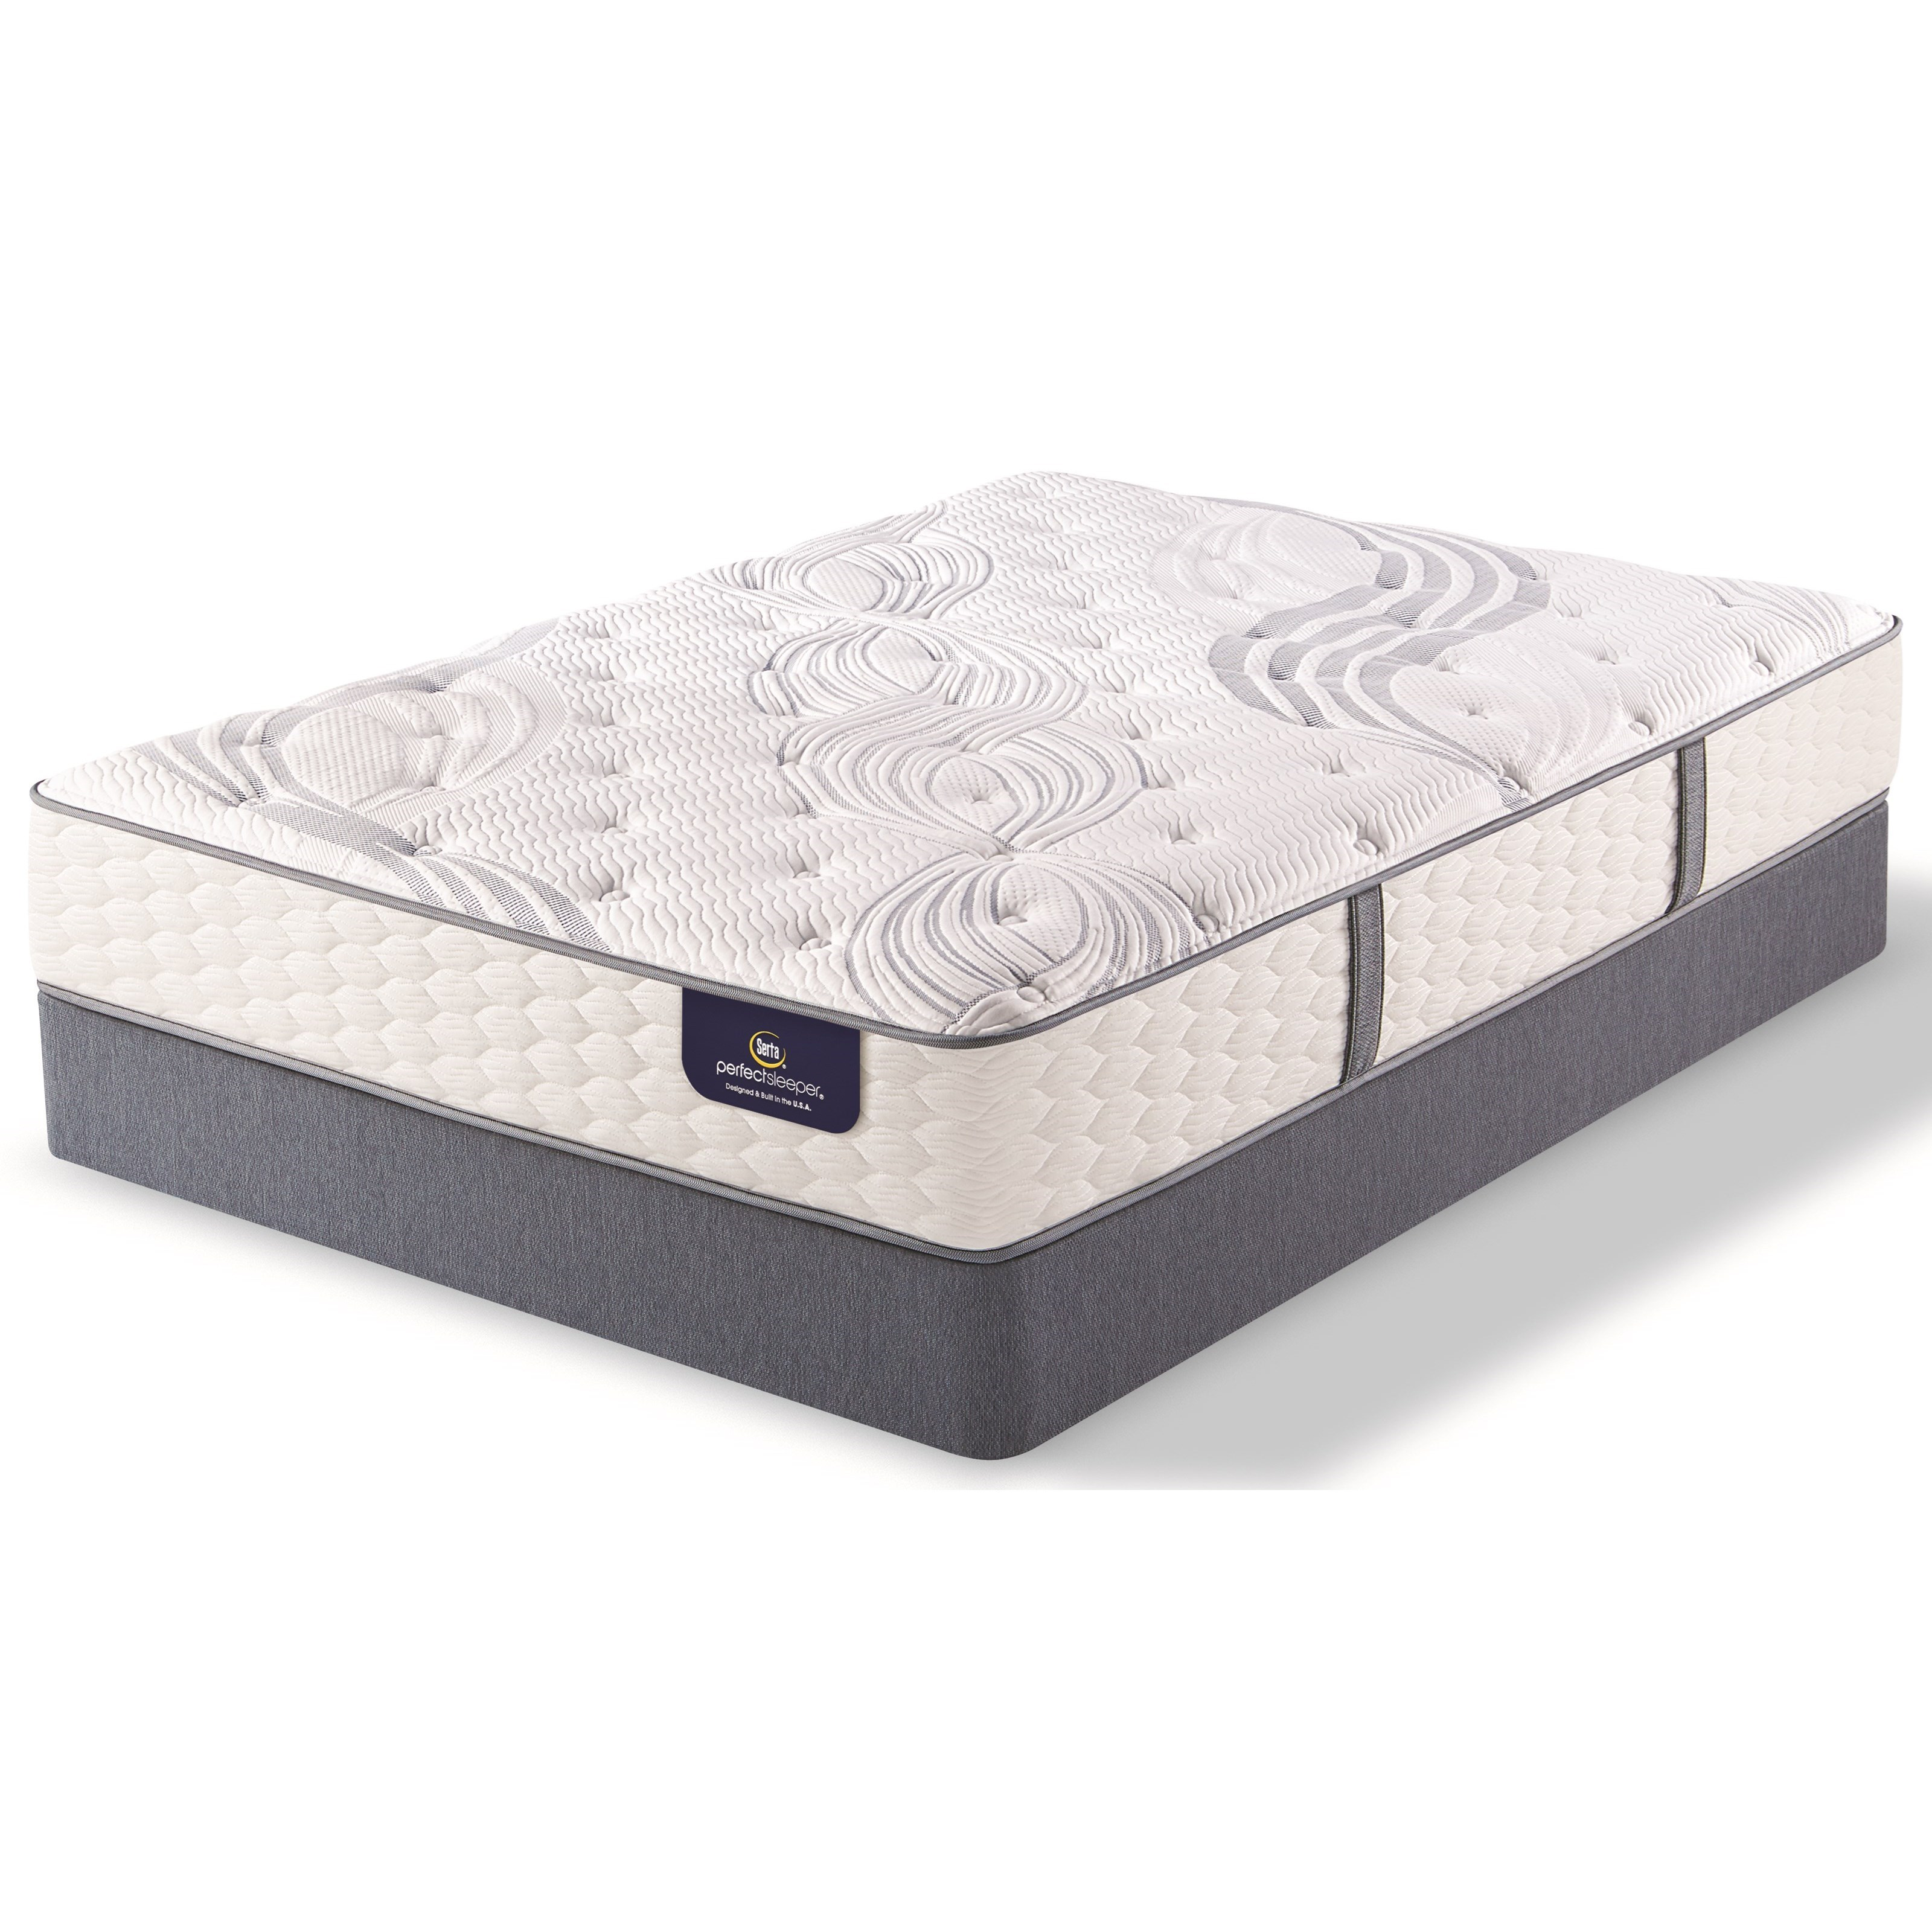 Serta Annapolis Twin Plush Pocketed Coil Mattress Set - Item Number: PSEPlush-T+StabL-Base-T